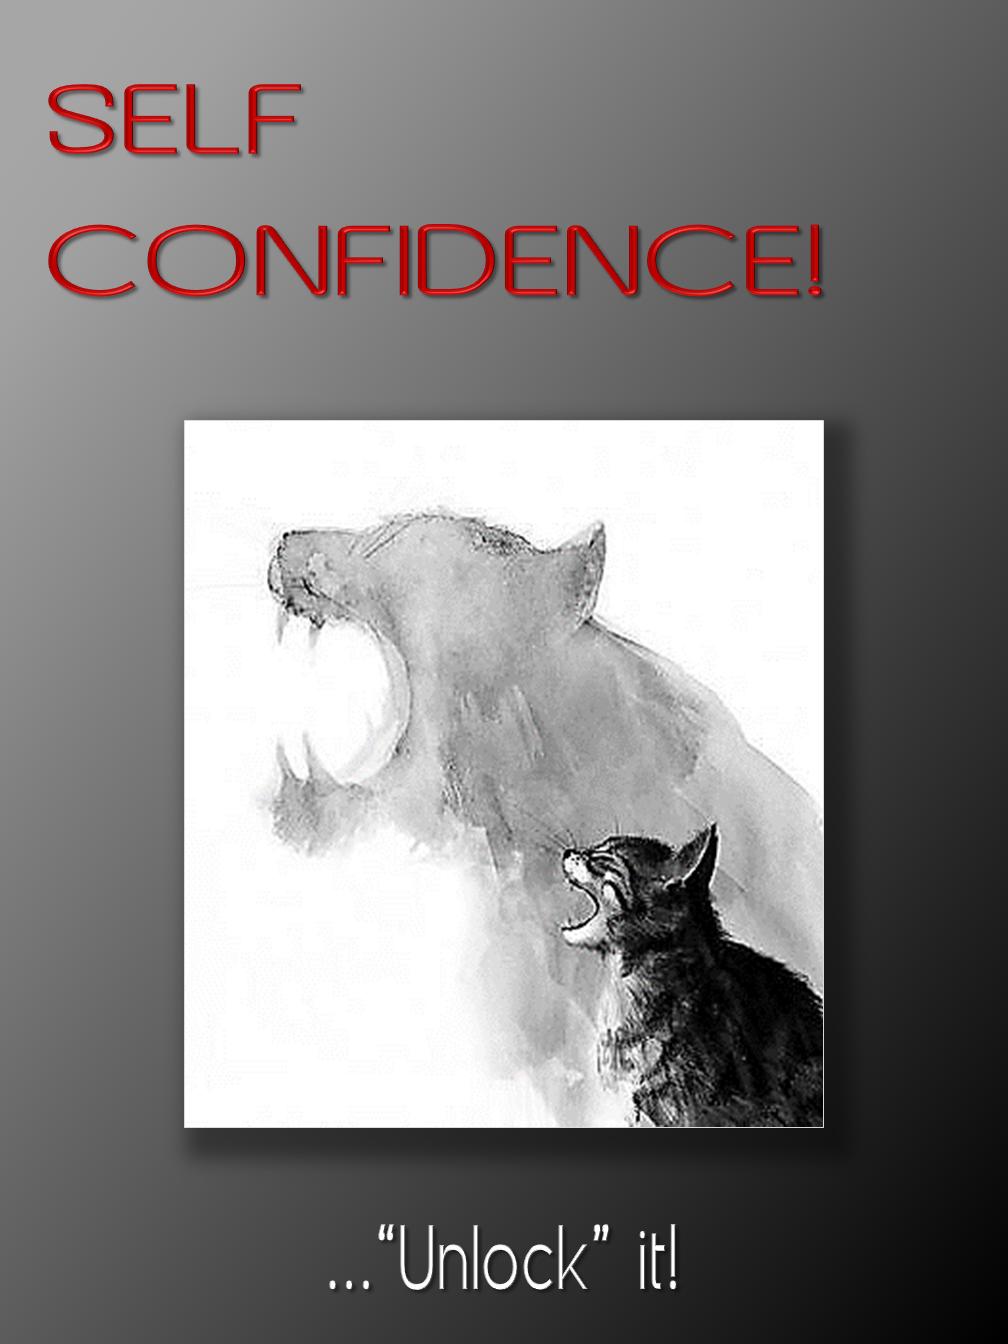 SELF CONFIDENCE!